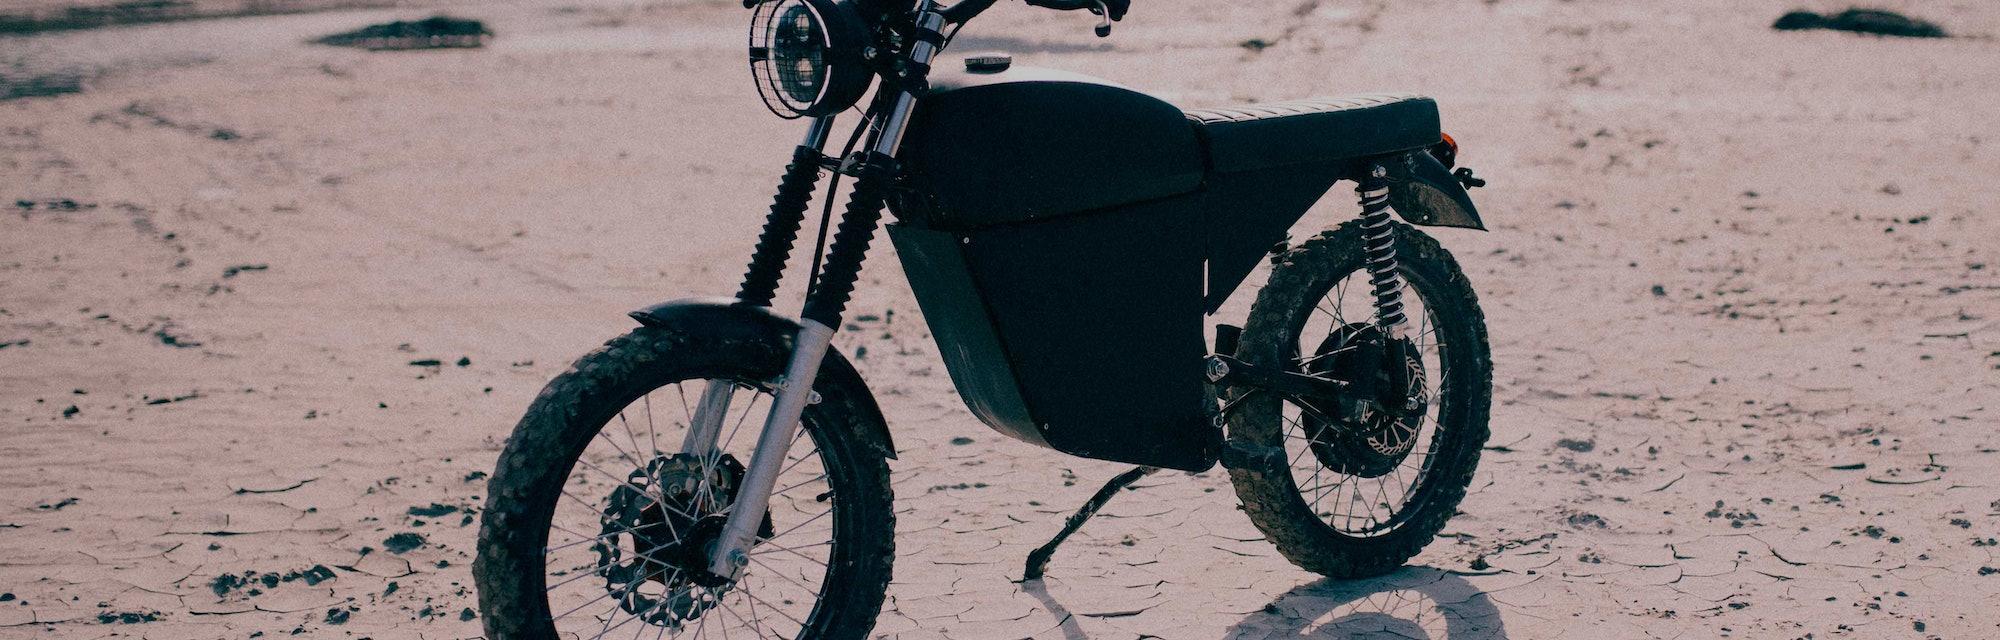 BlackTea moped outdoors.